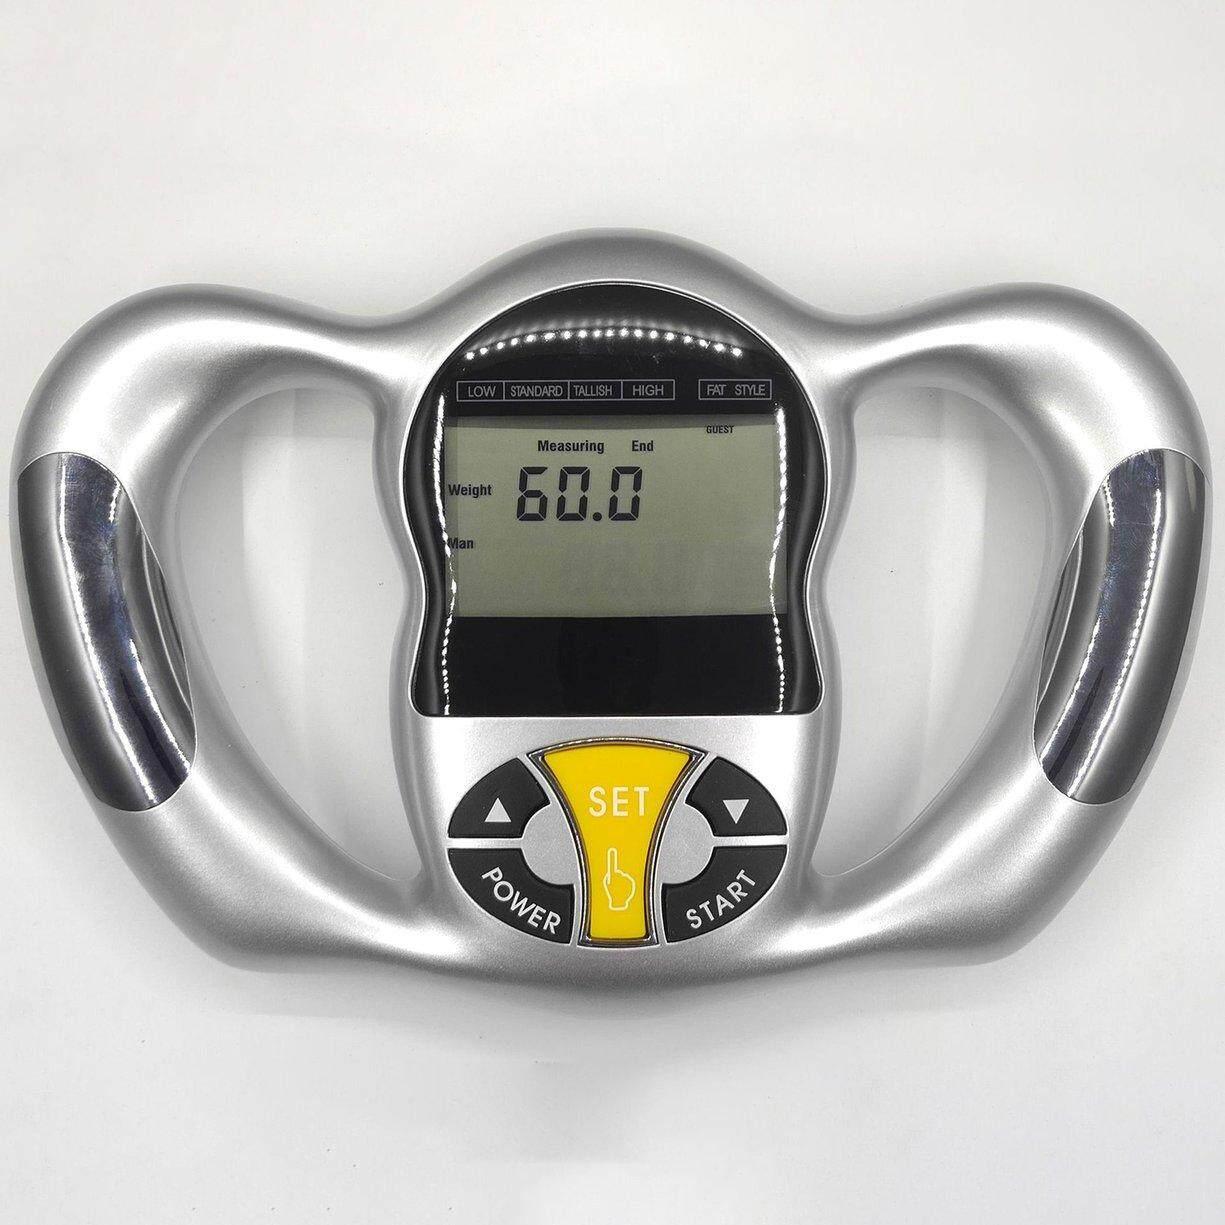 Best Sales Body Fat Measuring Instrument Body Bmi 6 Seconds Fat Measuring Instrument